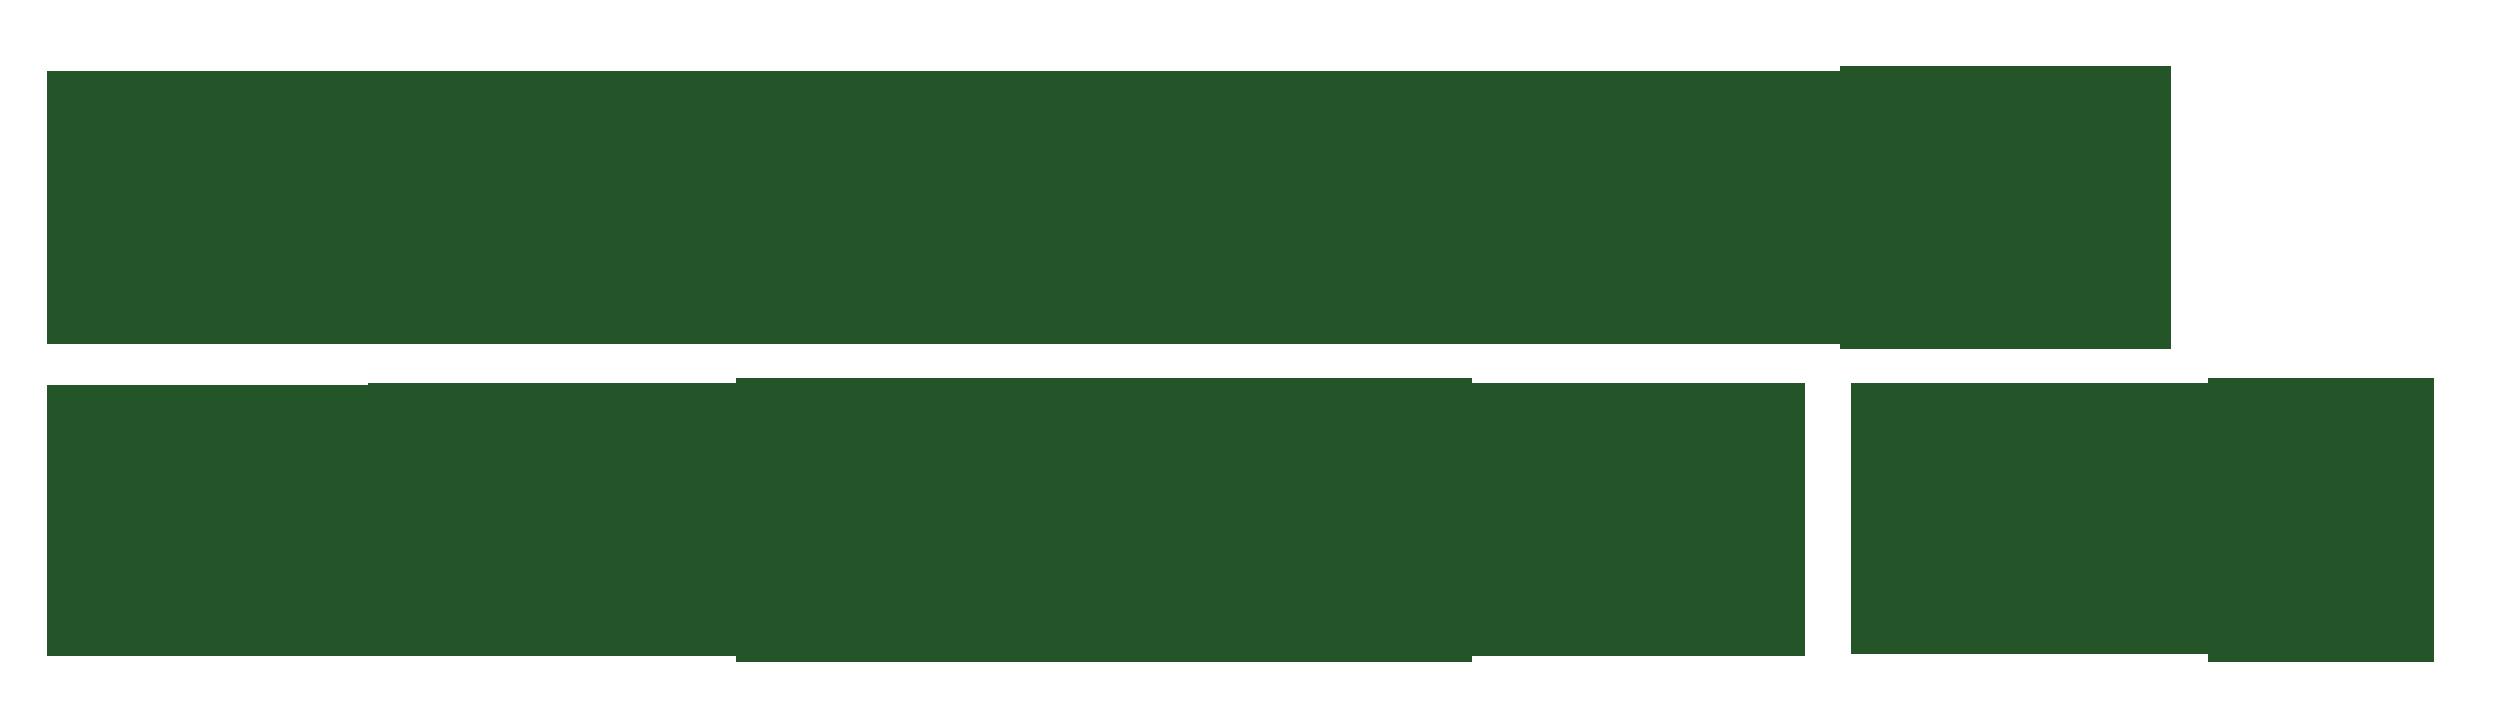 Nyhavns_faergekro_logo